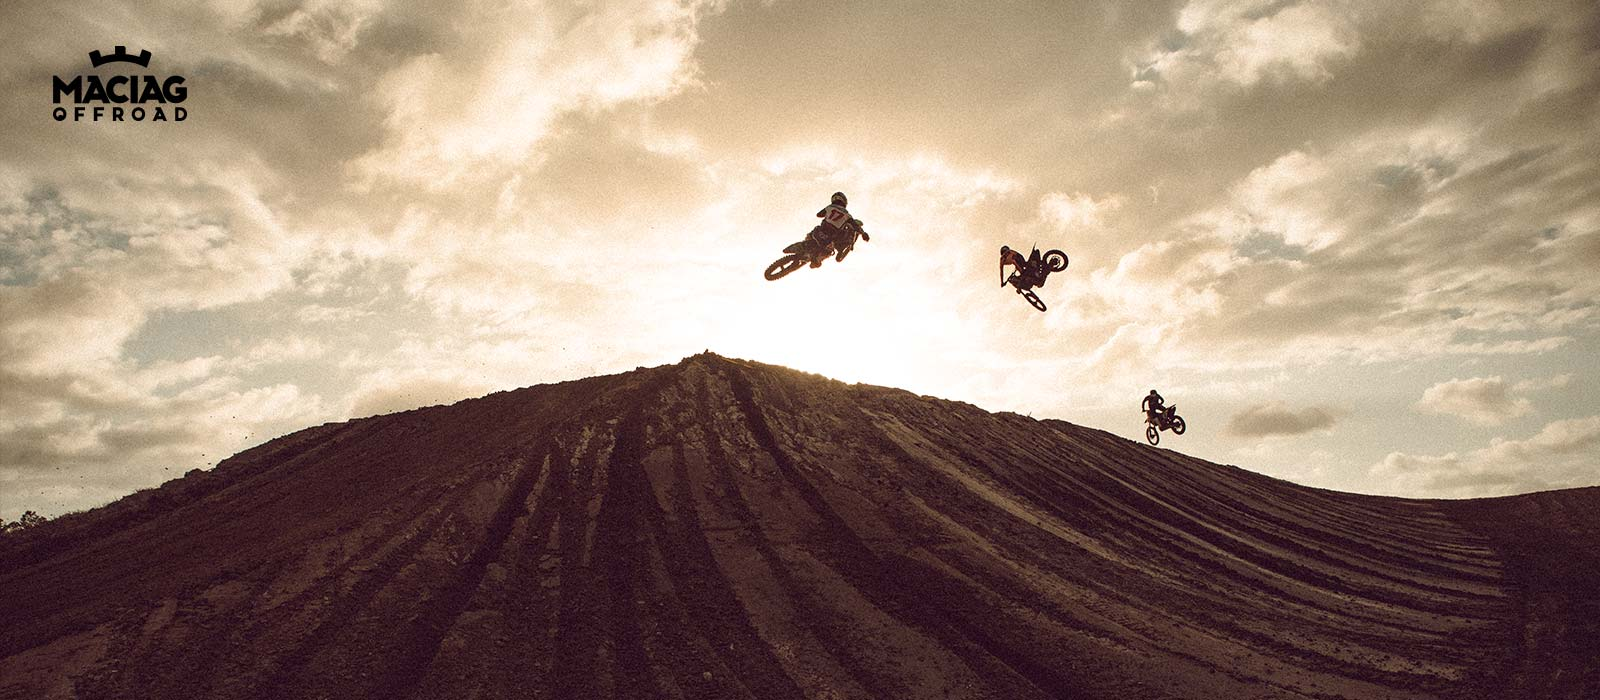 Fox Racewear MX 2019 Wallpaper Motocross